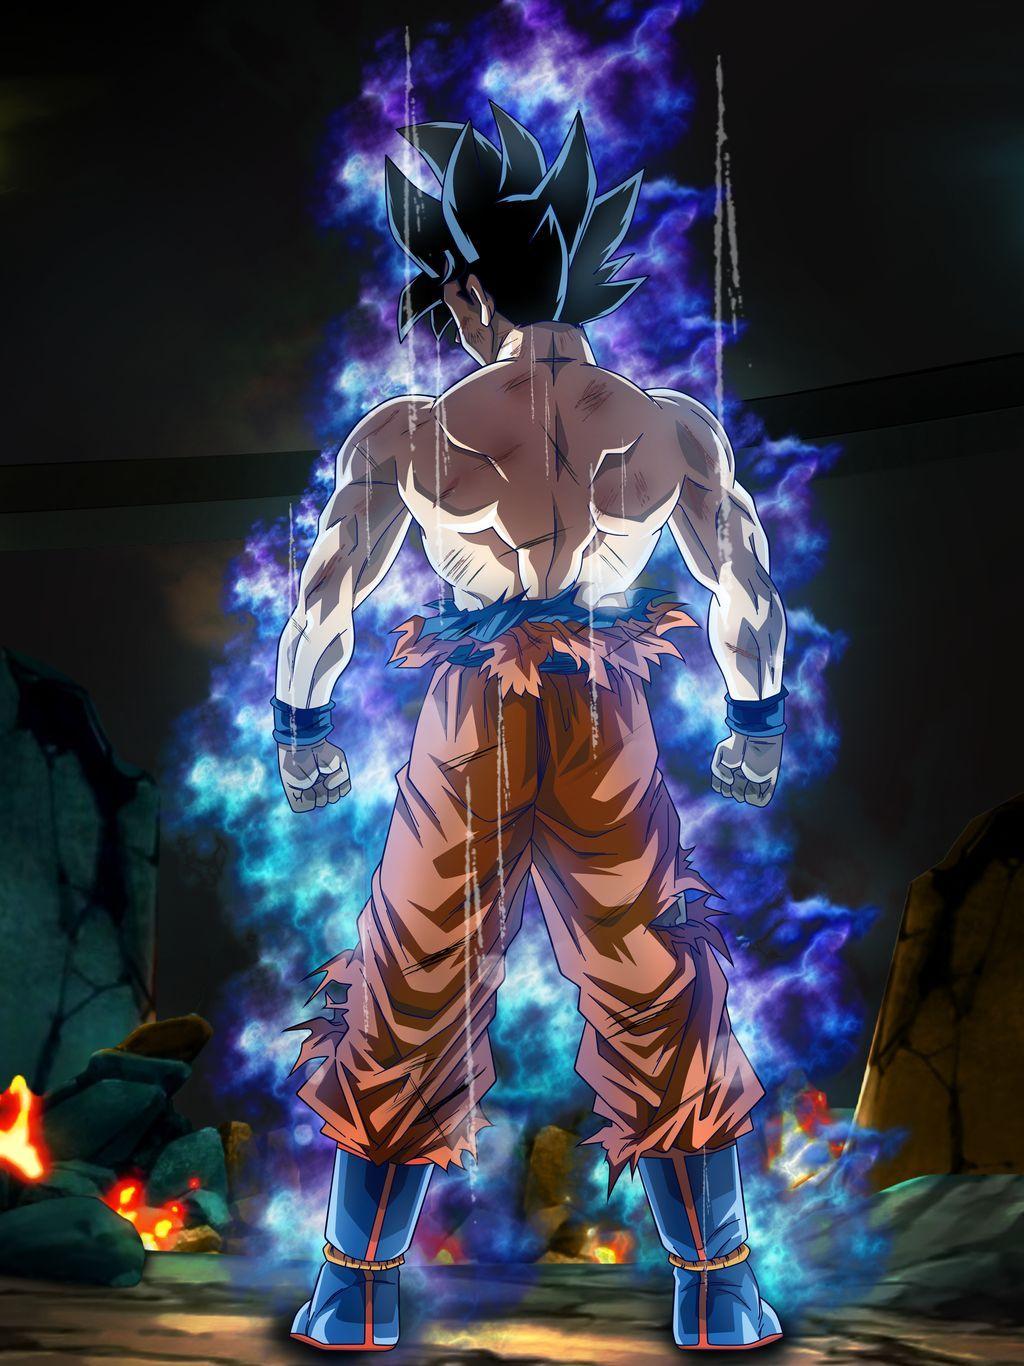 Migatte no Goku'i by Koku78 on DeviantArt Dessin sangoku